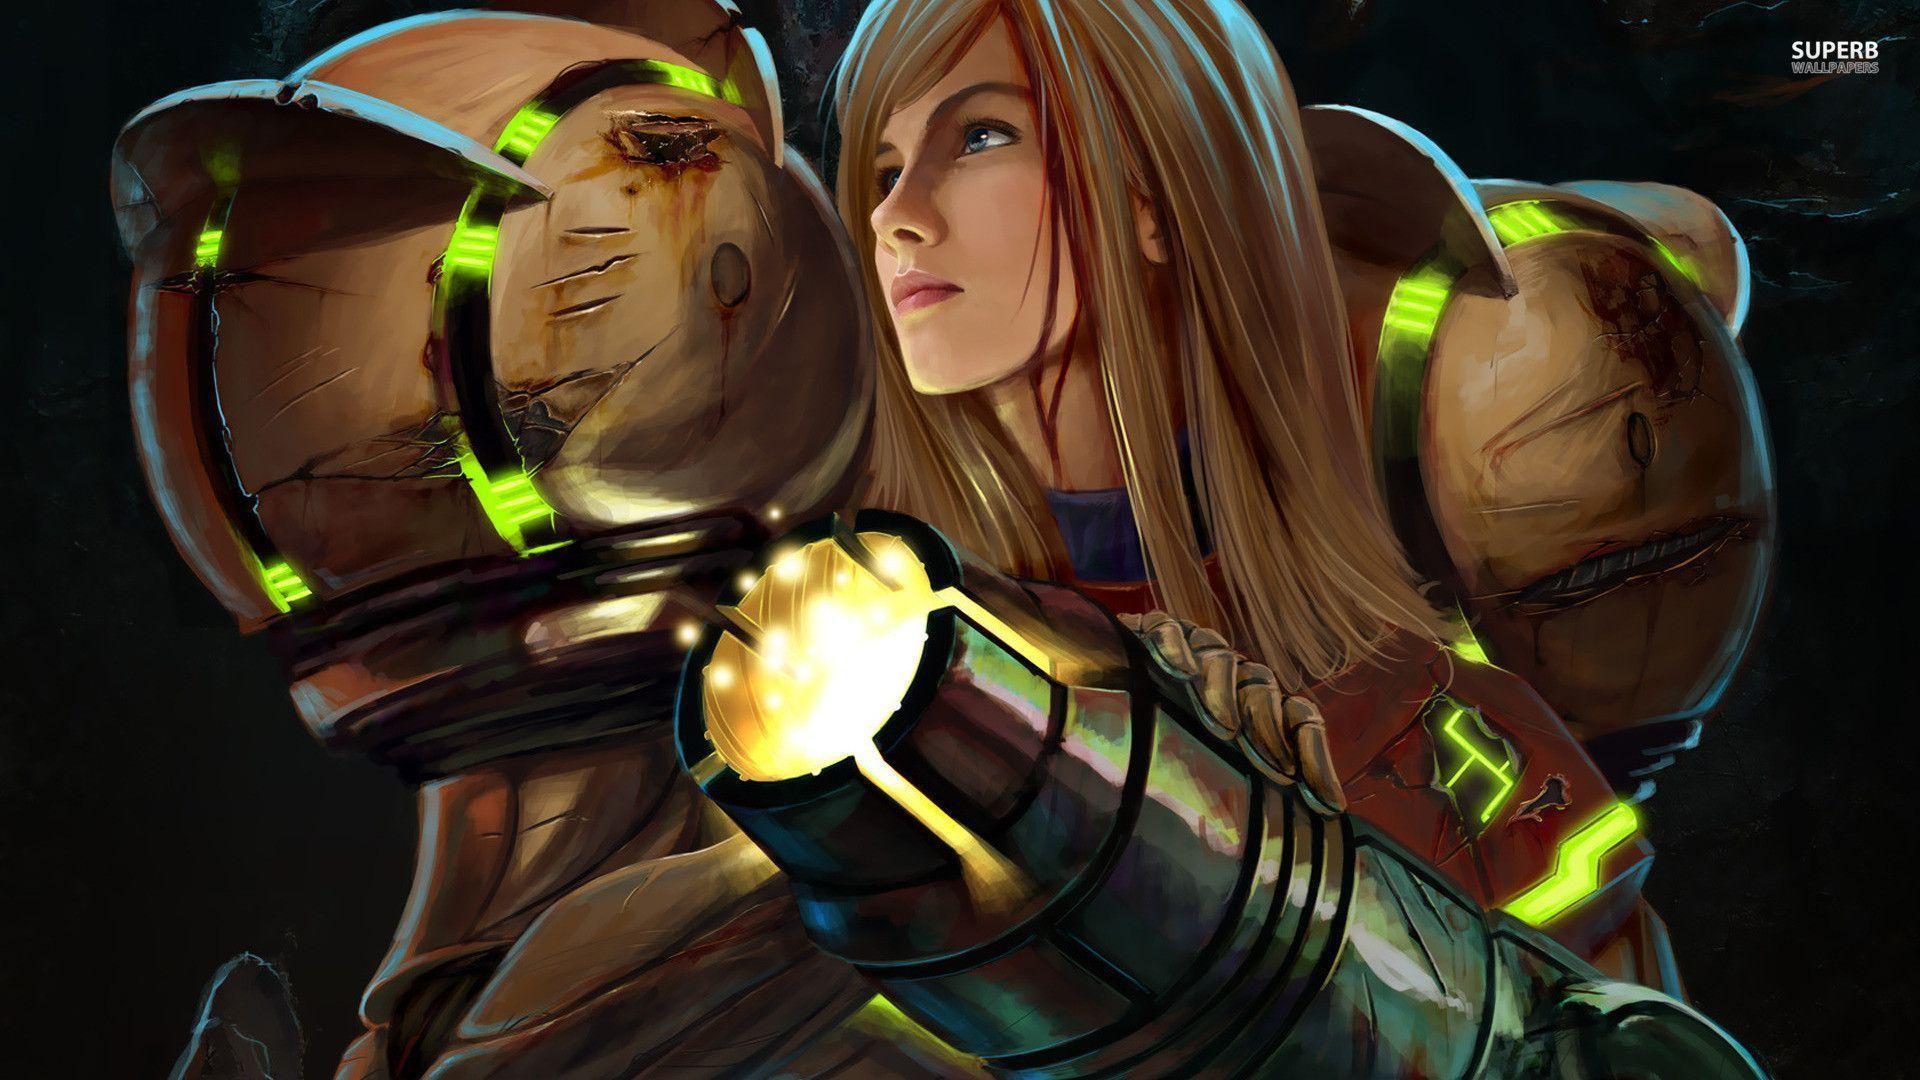 Samus Aran – Metroid Prime wallpaper – Game wallpapers – #